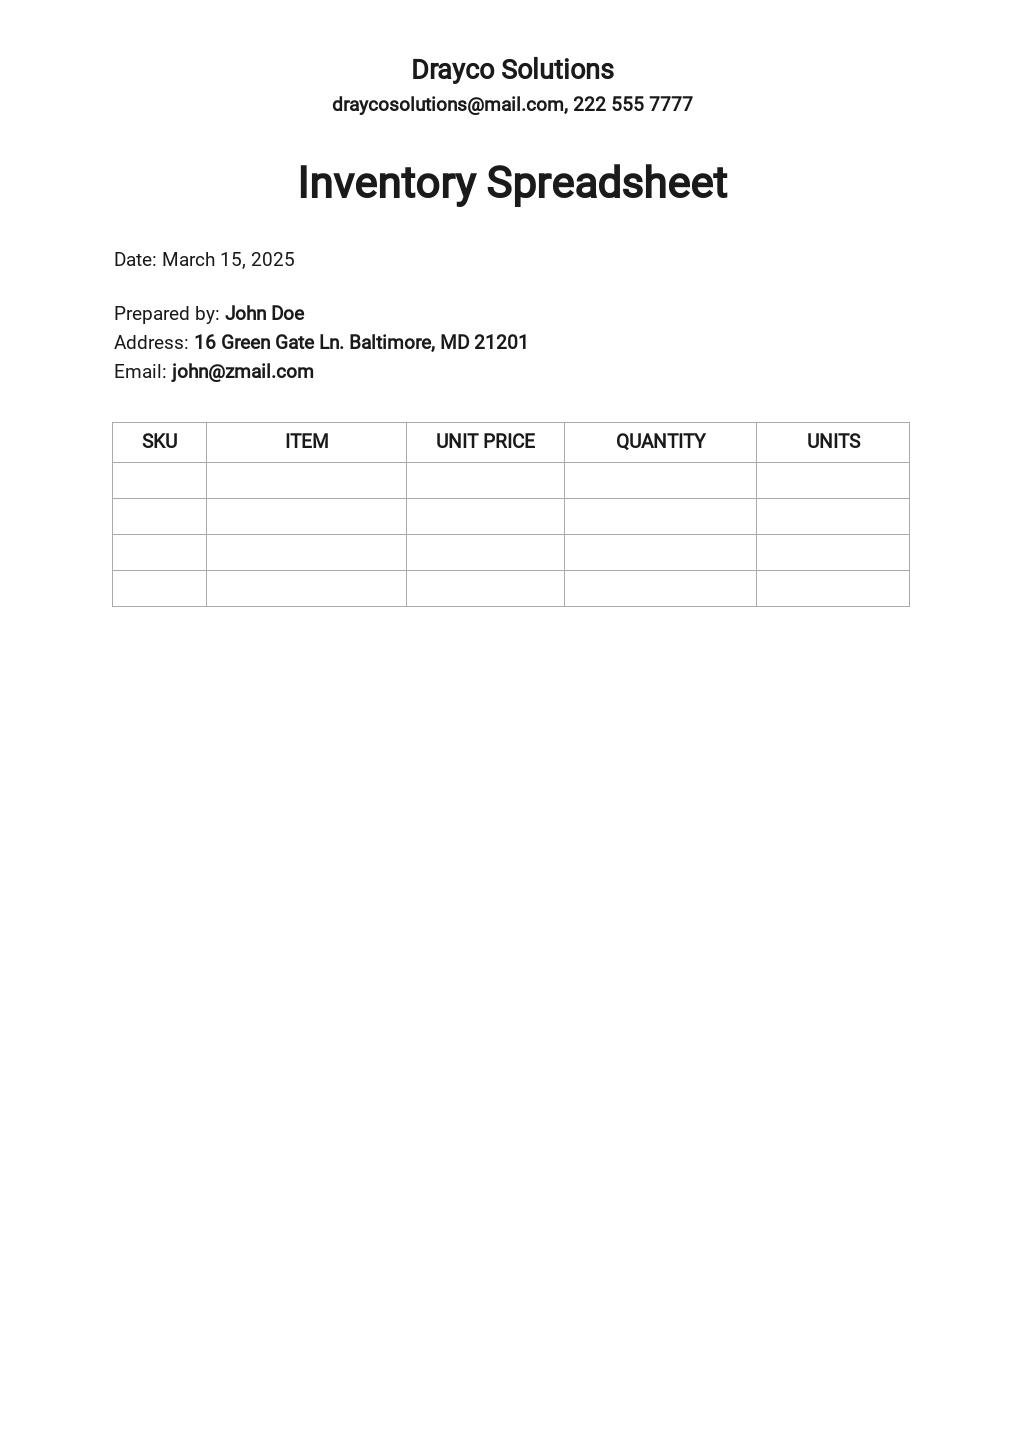 Free Blank Inventory Spreadsheet Template.jpe